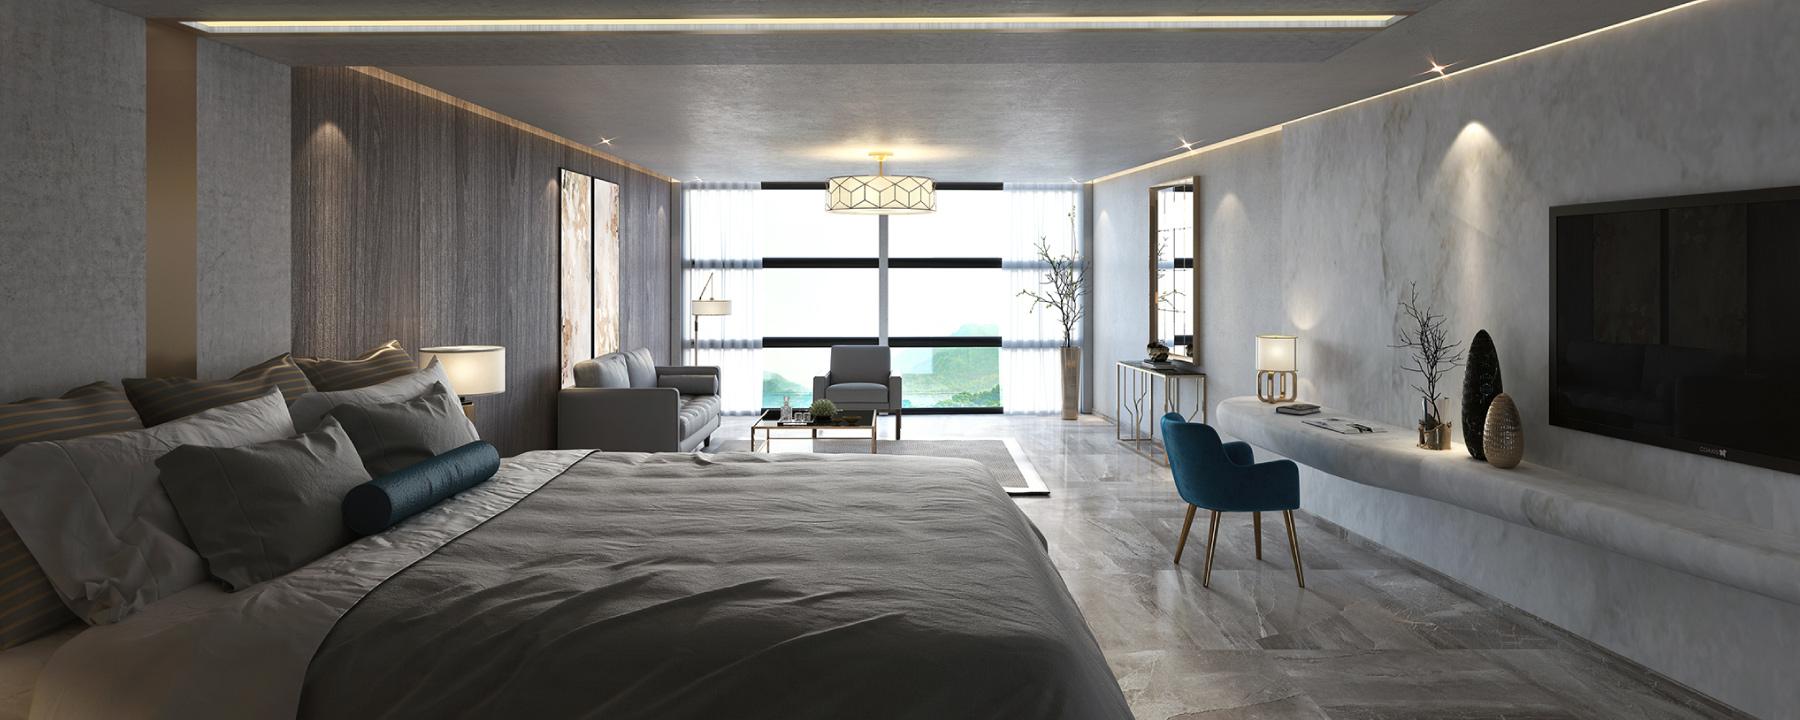 Montviro - Deluxe Room